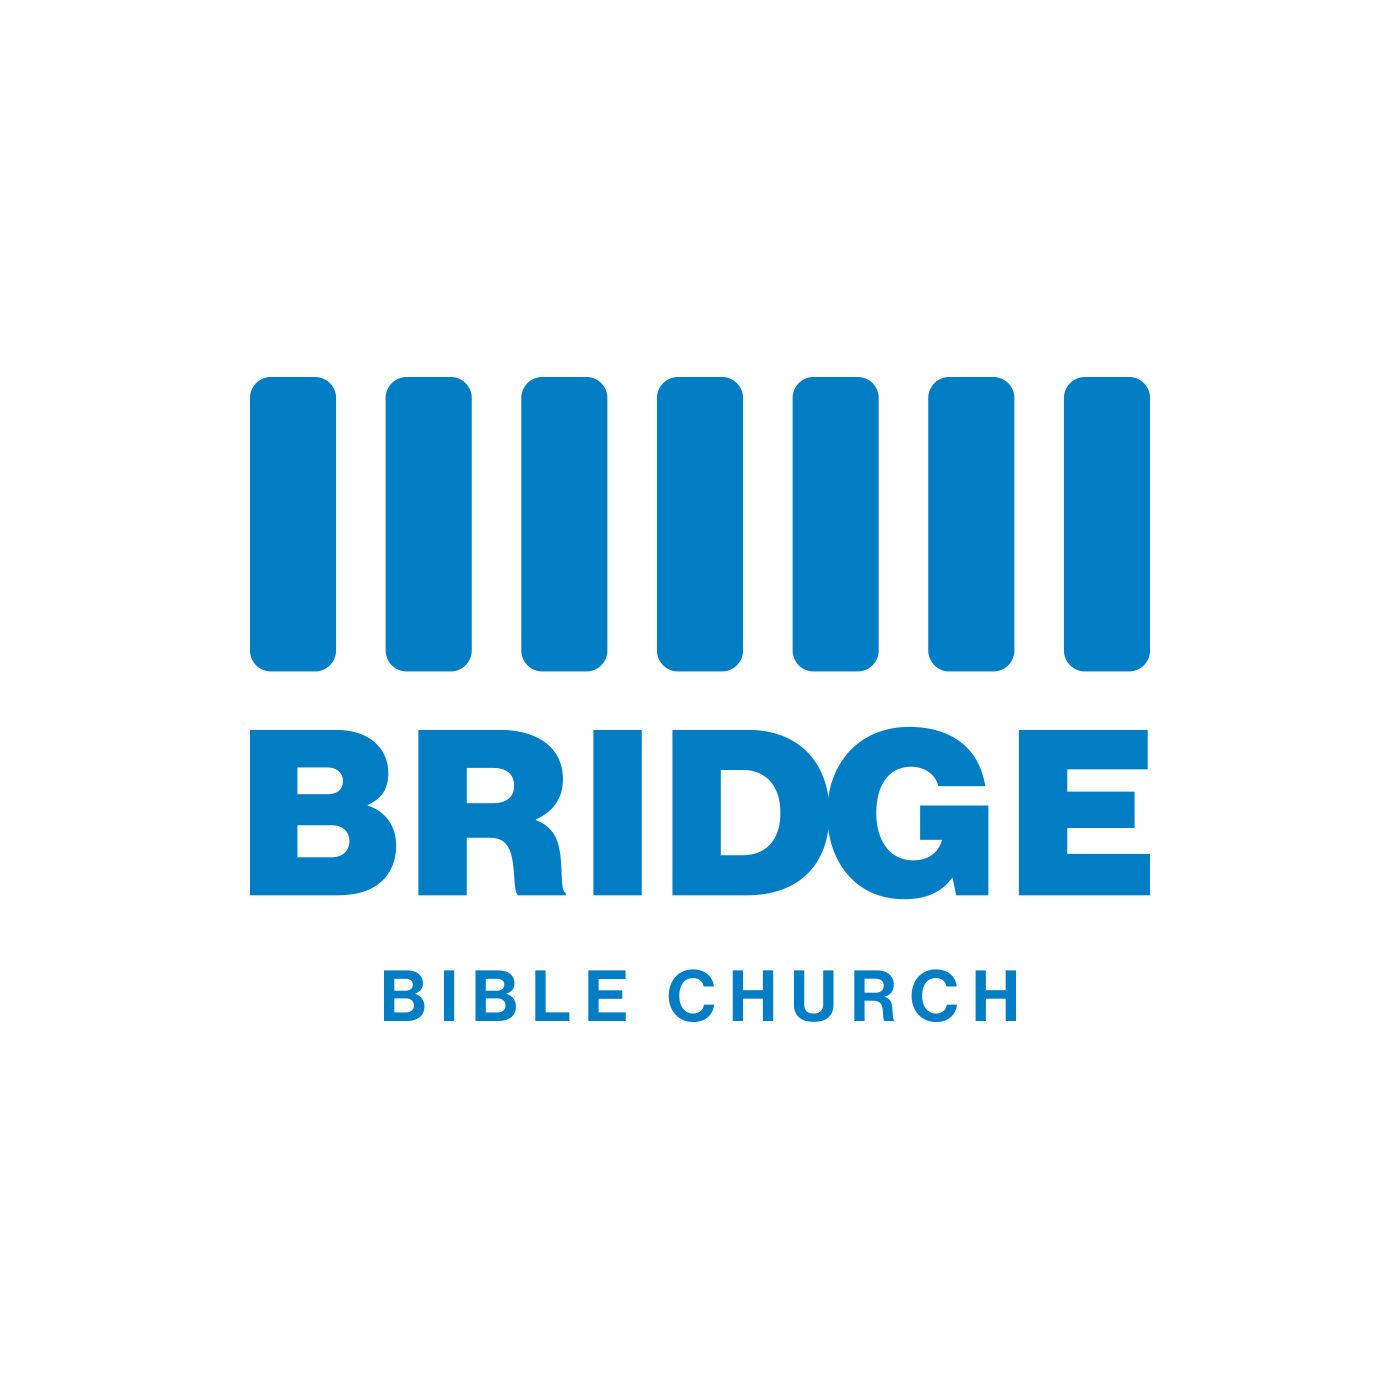 The Bridge Bible Church